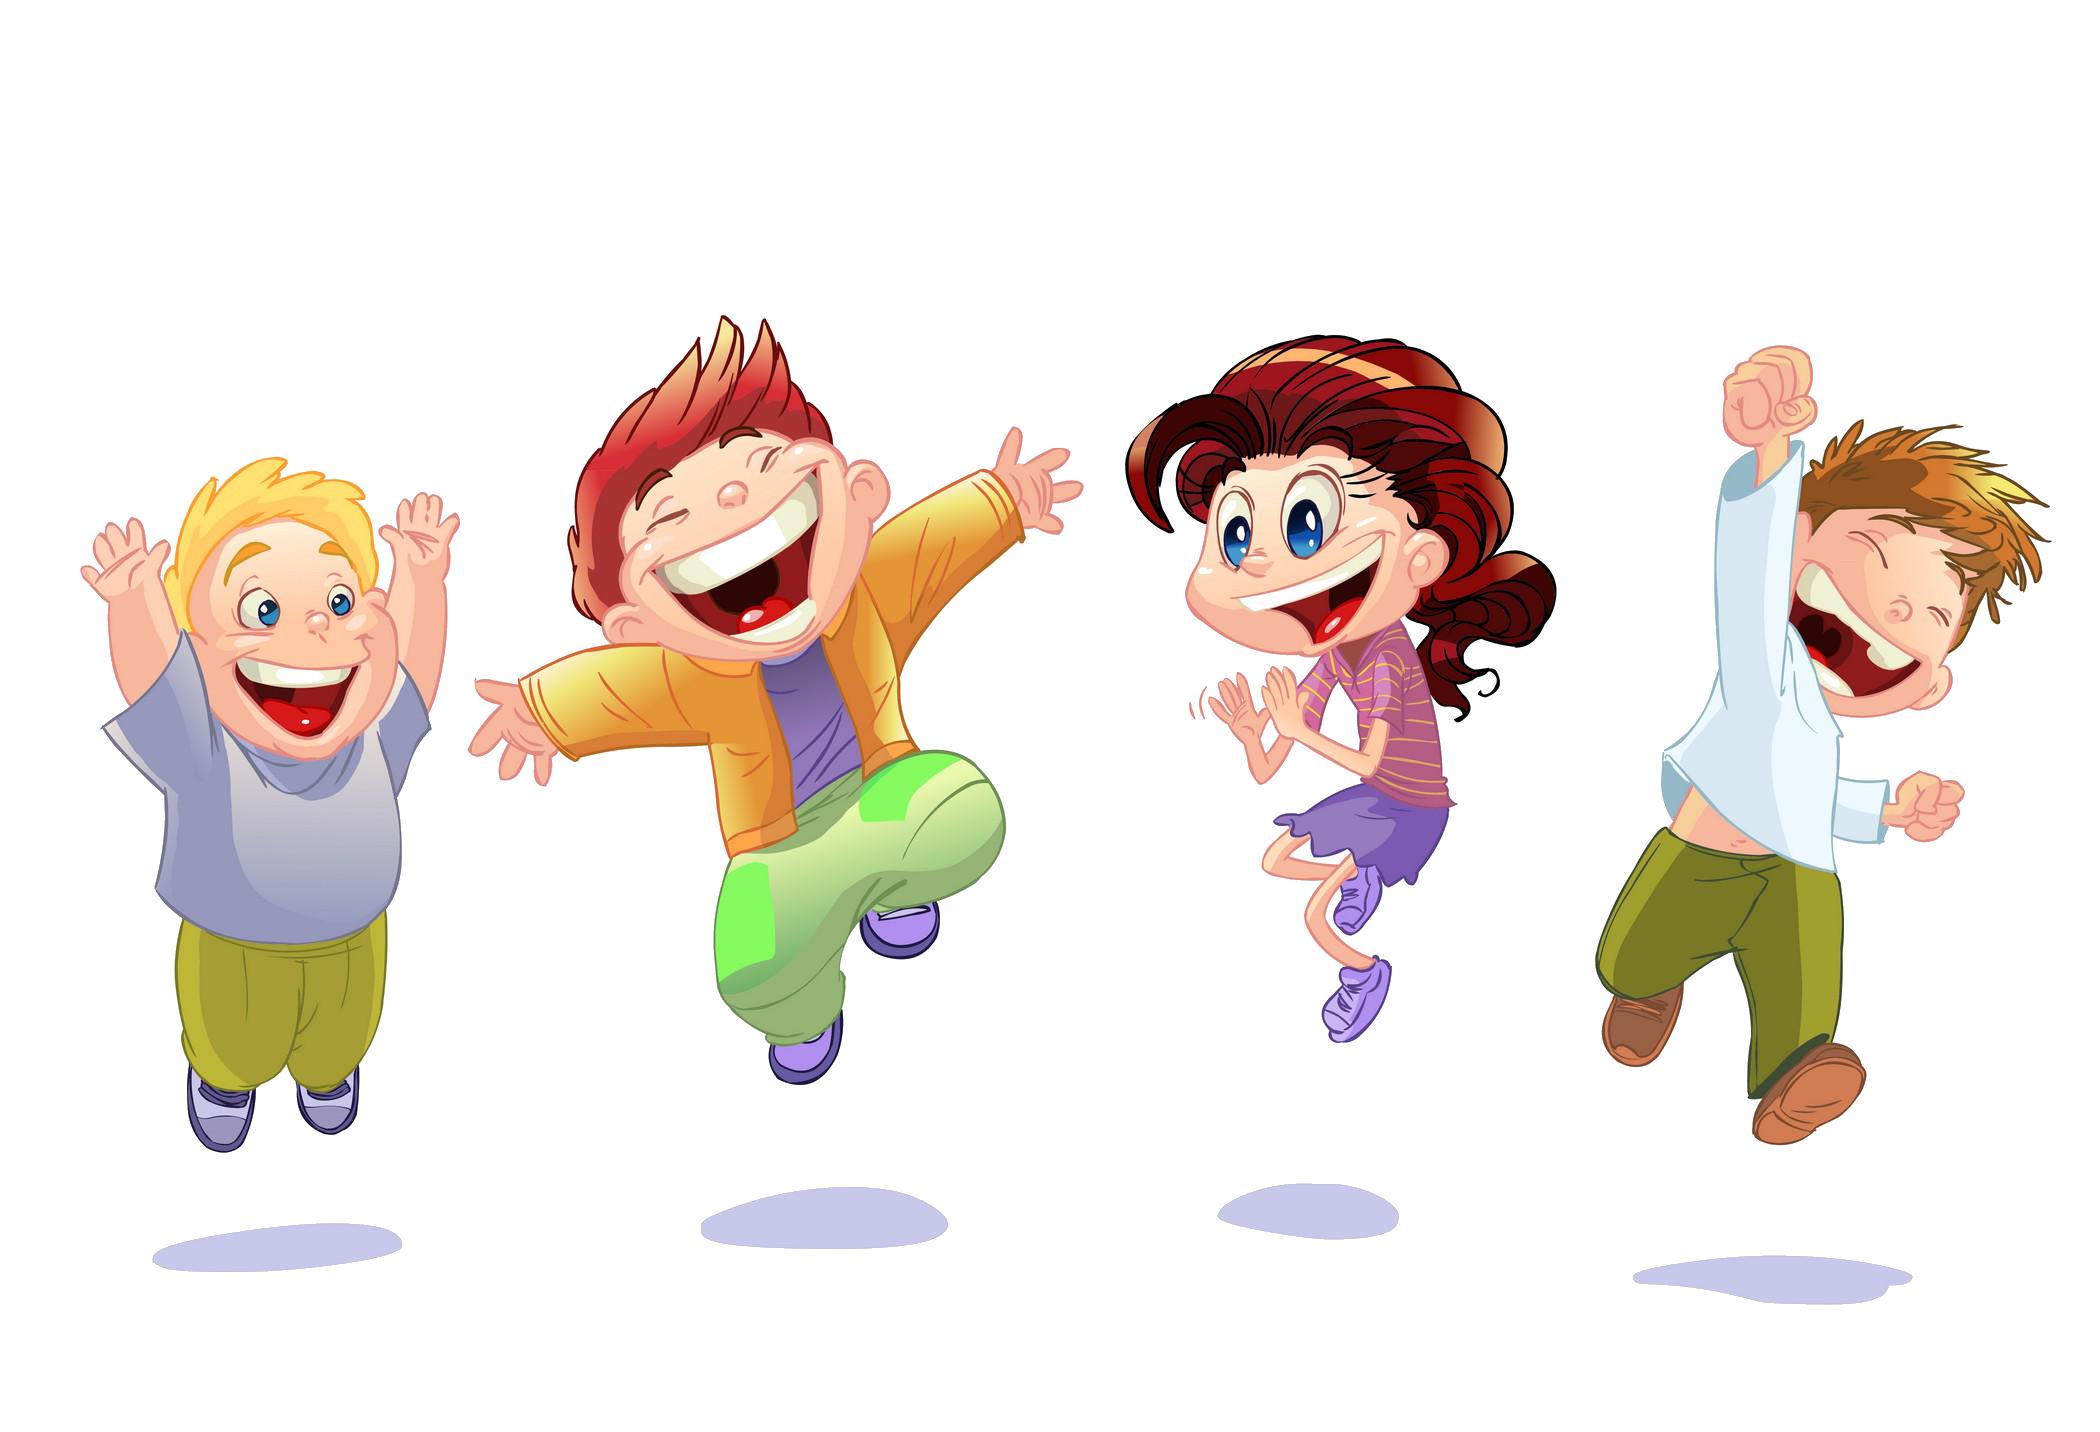 Download Cute Kids PNG Transparent Image.